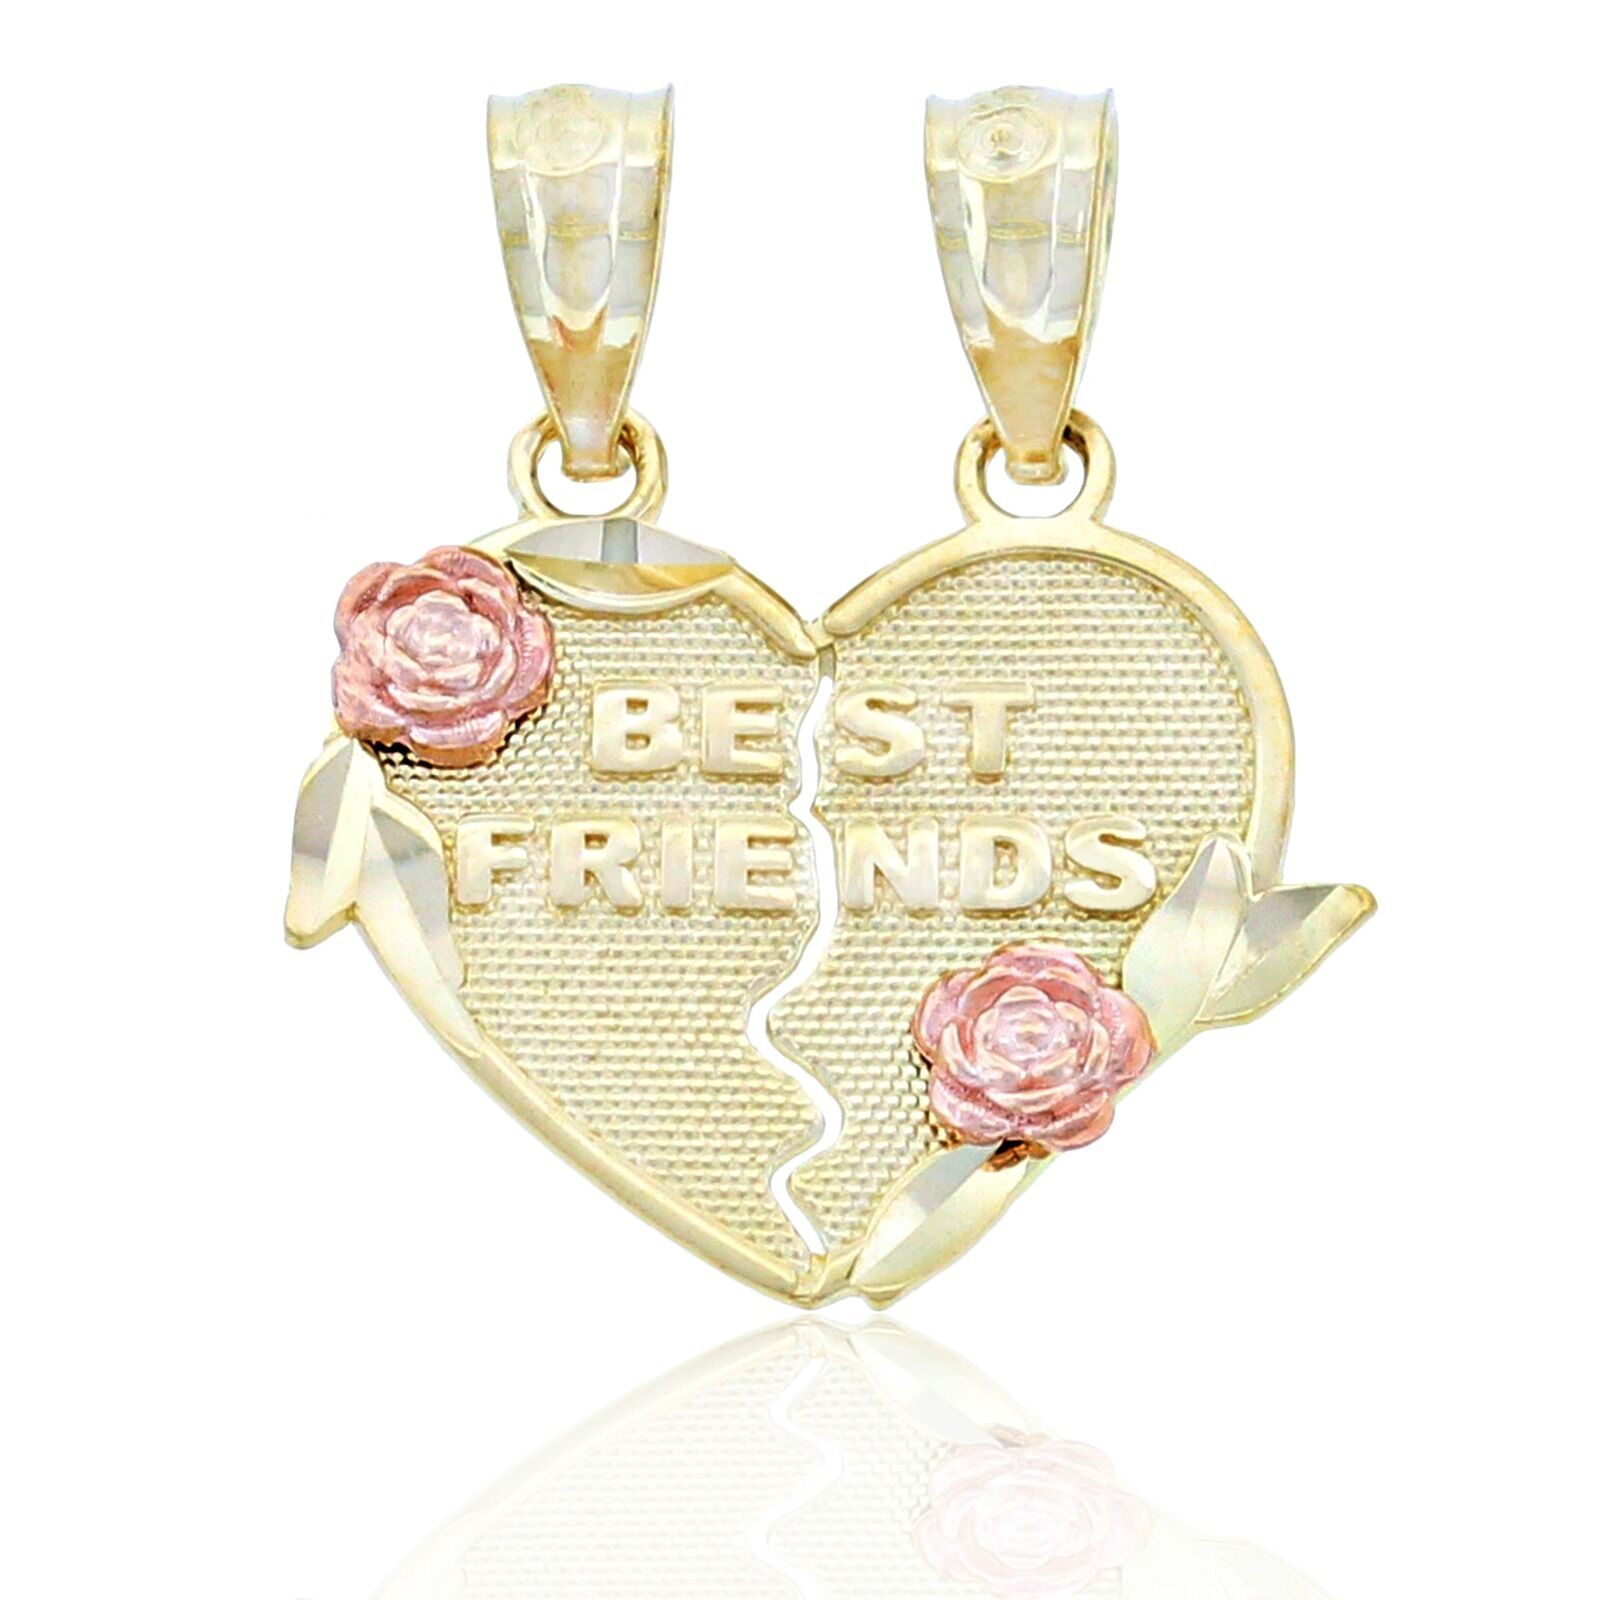 gold Best Friends Break-apart Charm, 10k Solid gold, Charm America Jewelry